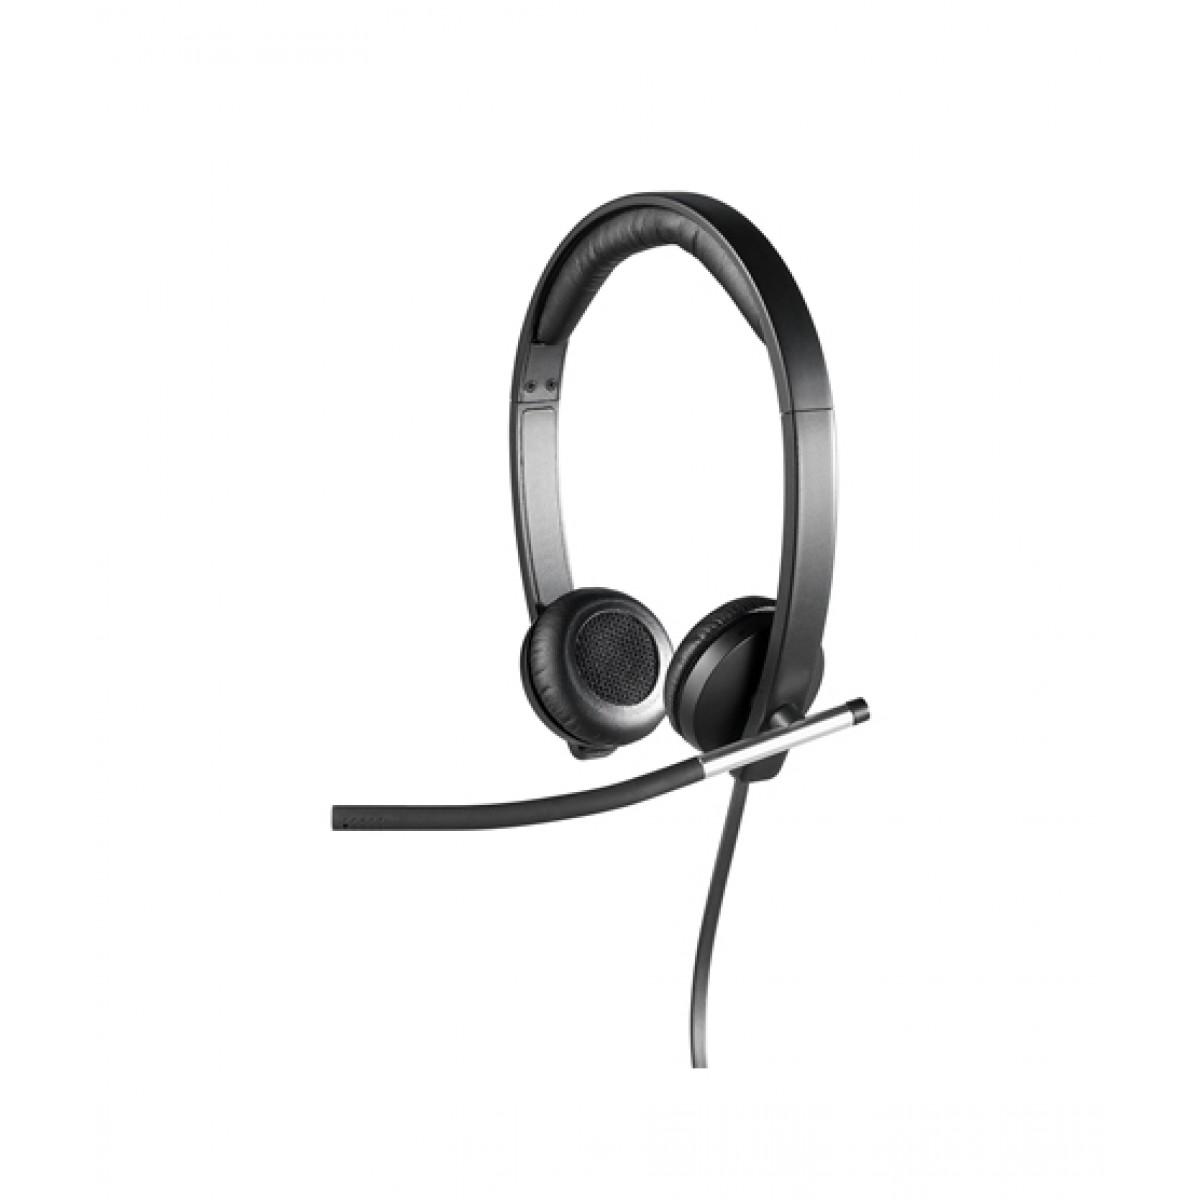 0f23352a5d8 Logitech H650e Mono USB Headset Black (981-000545) Price in Pakistan | Buy  Logitech Headset | iShopping.pk